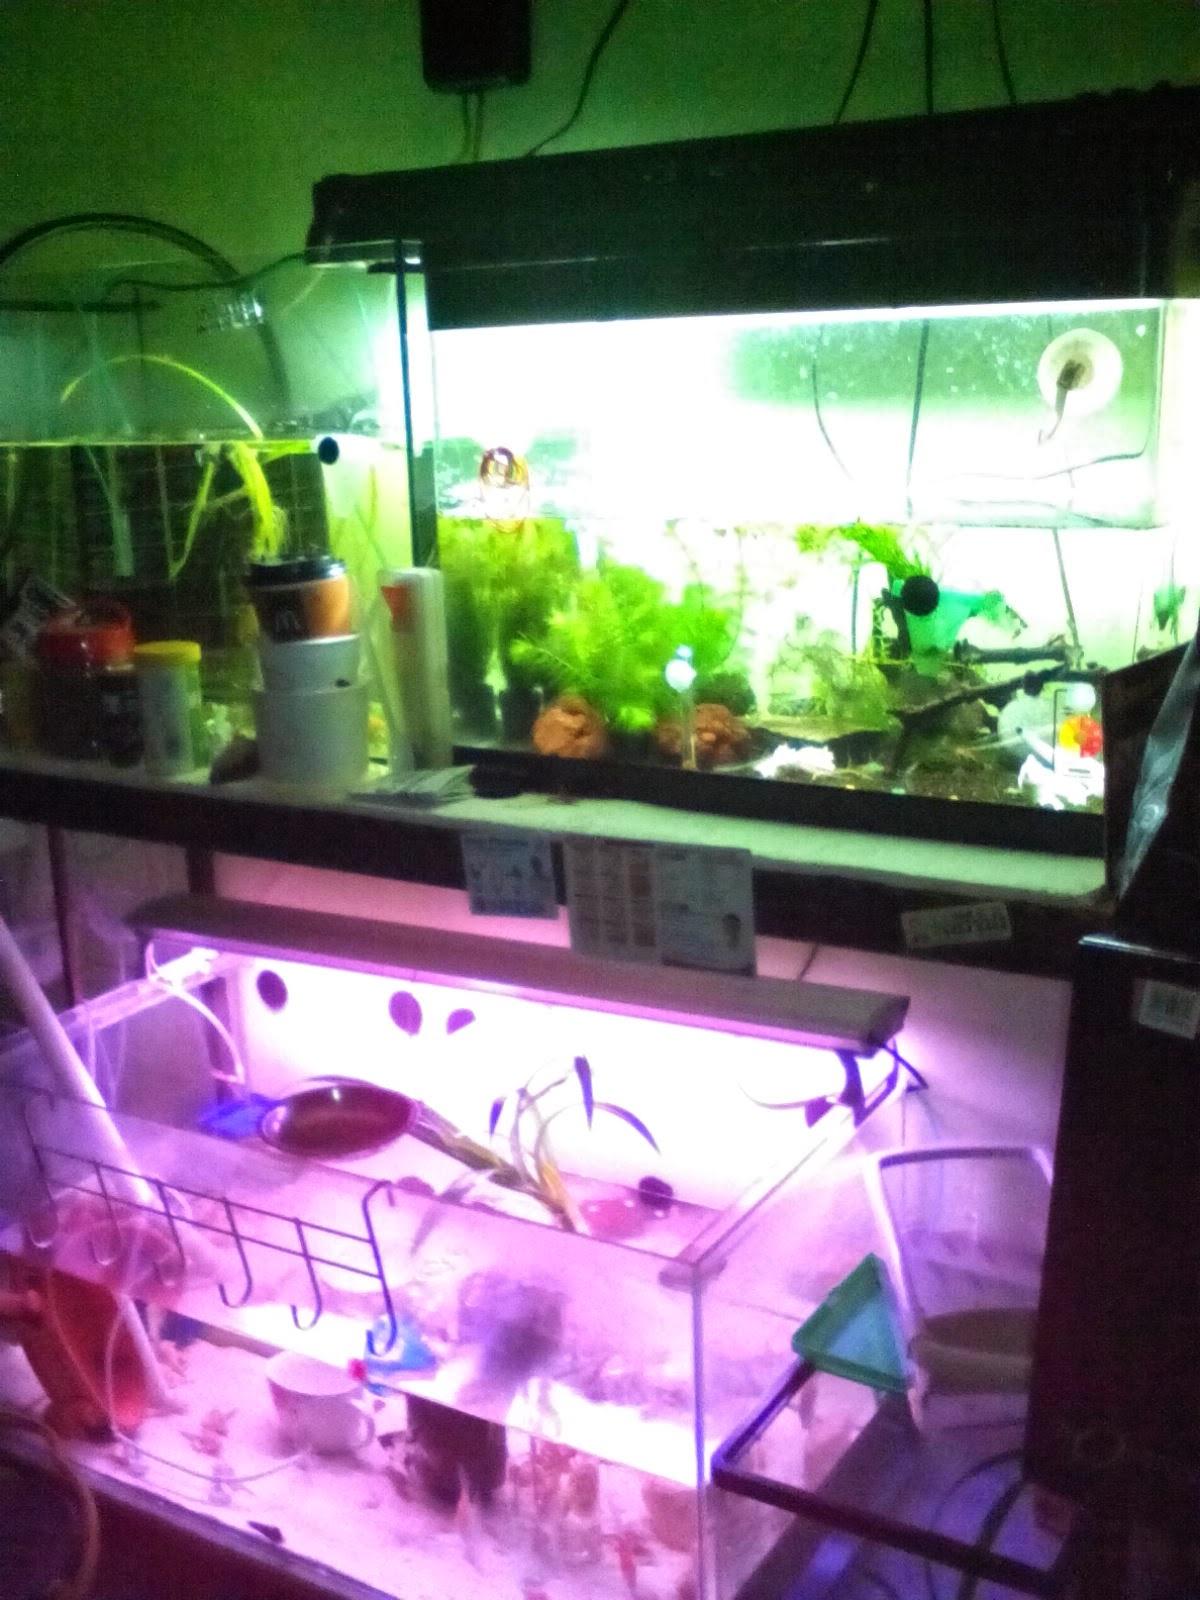 Man Fish Tanks And Aquarium CRS:  Angel and Betta fish tanks